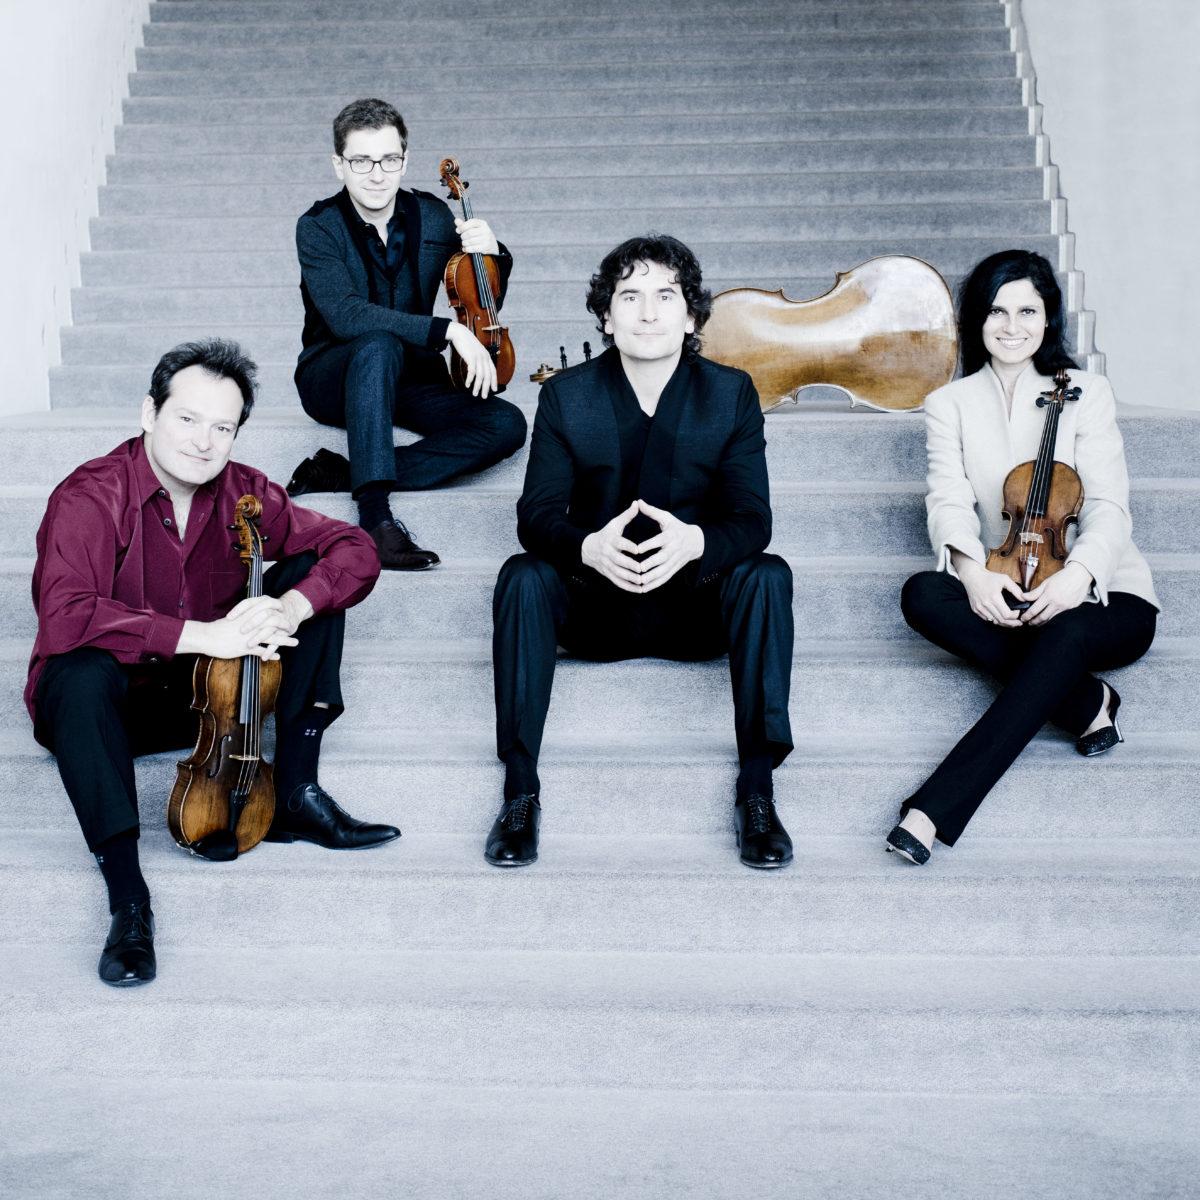 Schubert/Schostakowitsch/Beethoven, Belcea Quartet,  Elbphilharmonie Hamburg, Kleiner Saal